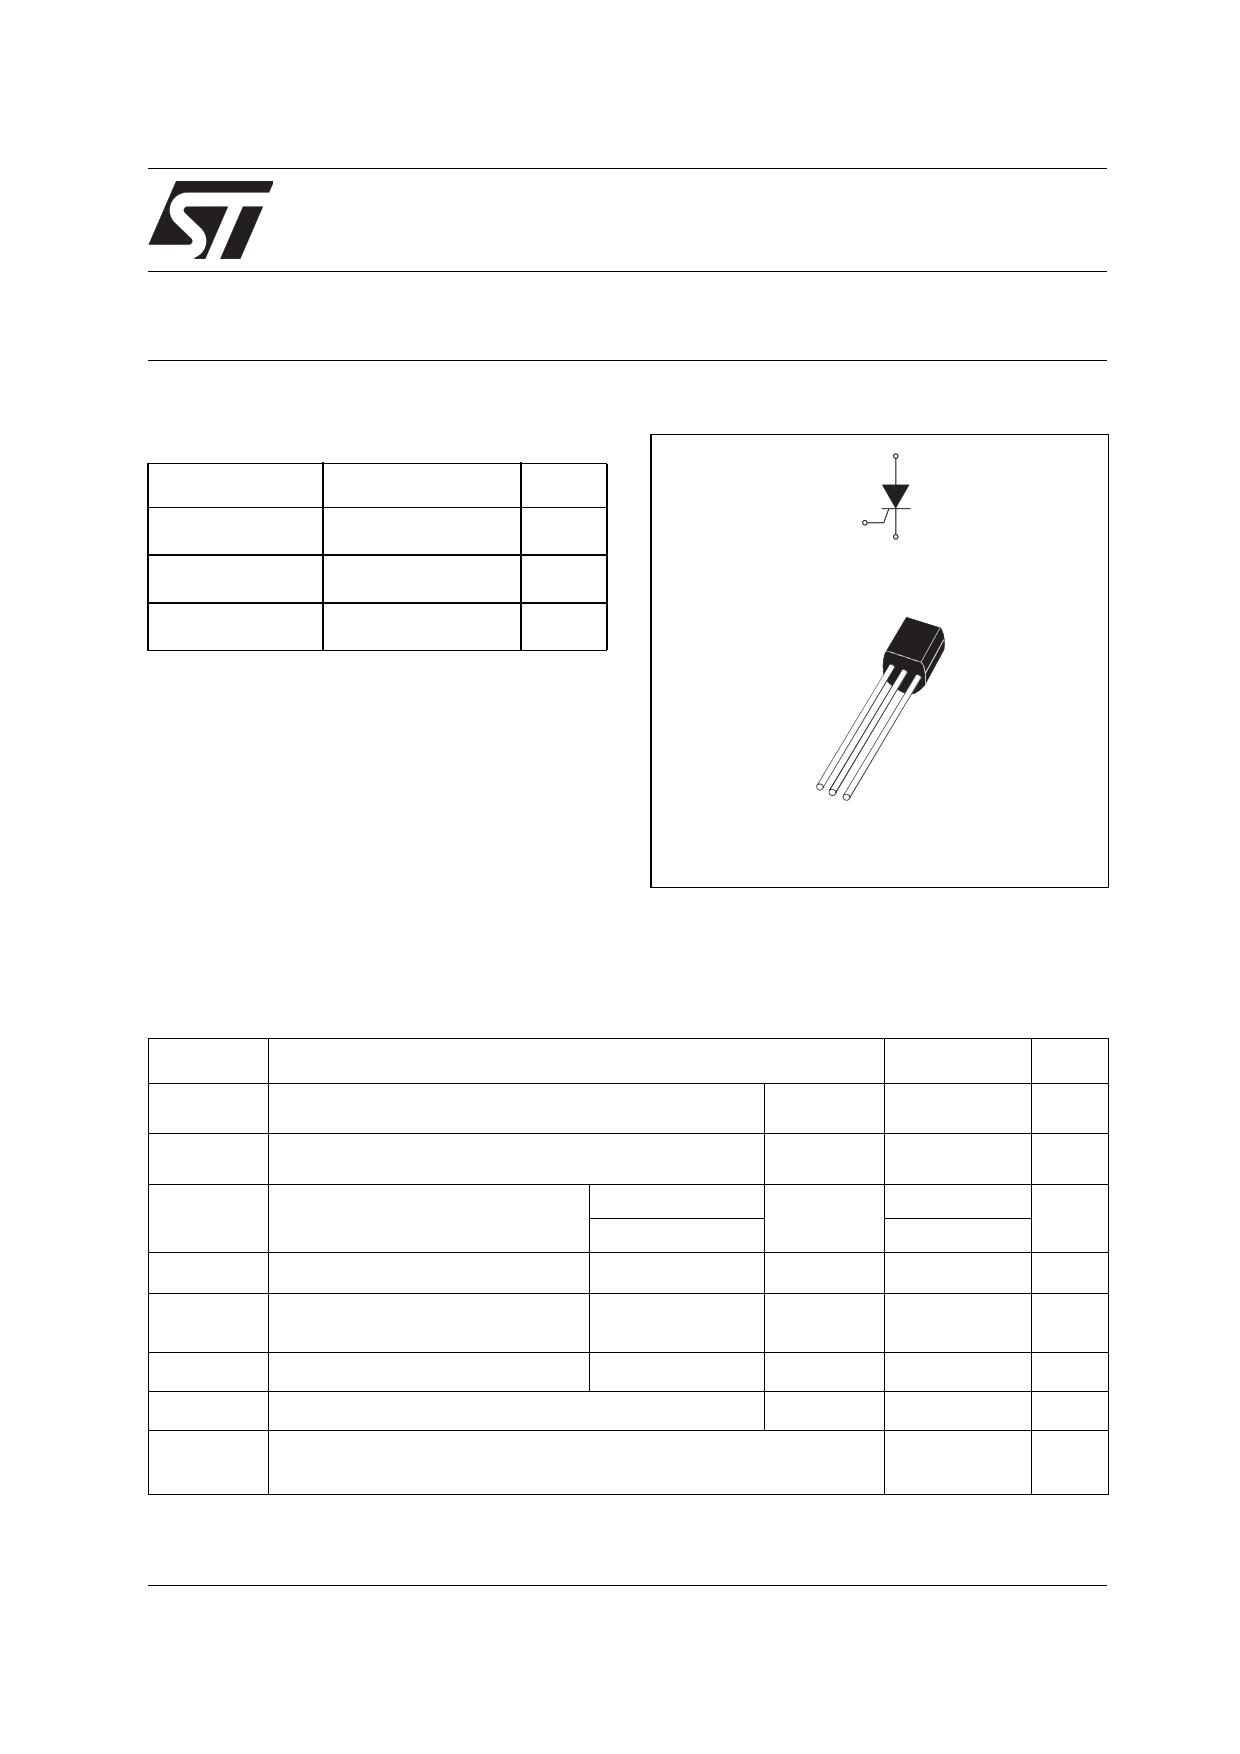 X00602MA5AL2 datasheet